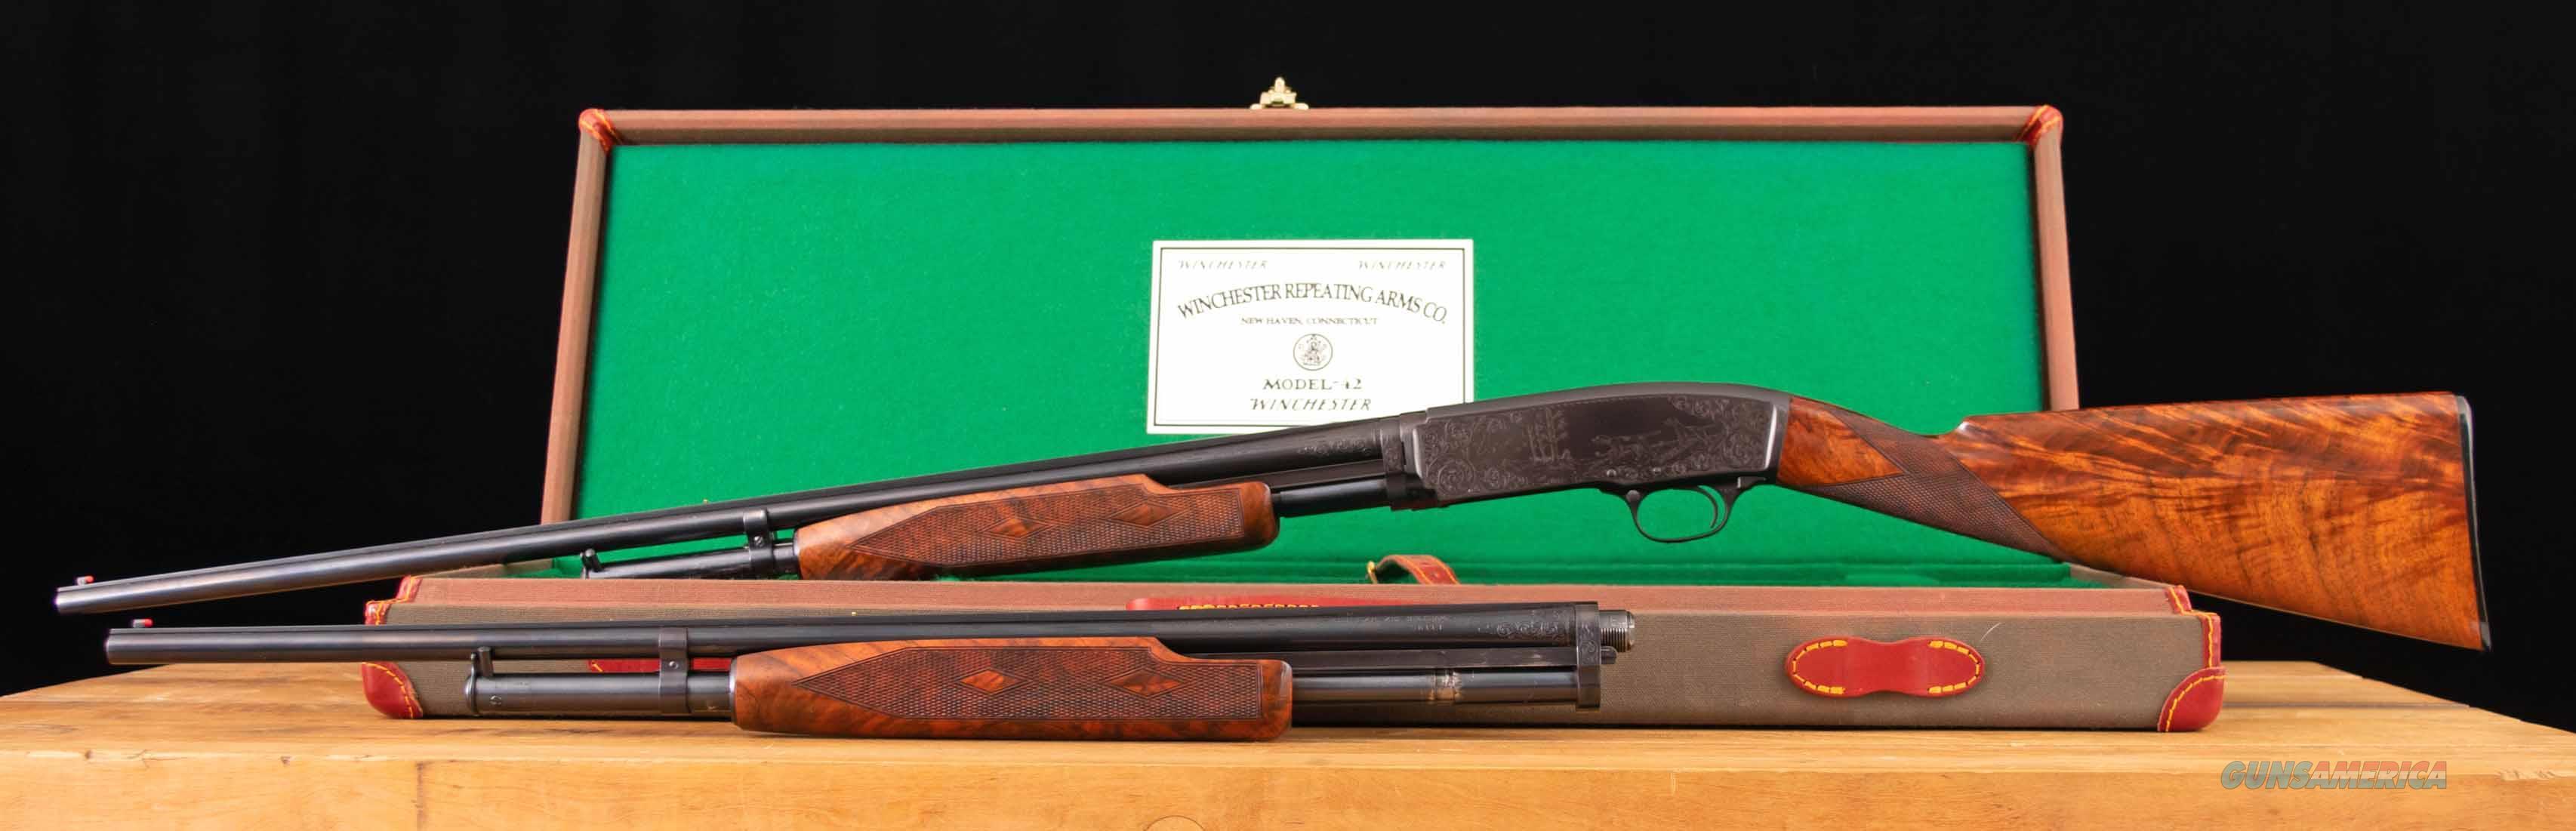 Winchester Model 42 – 2 BARREL SET, #5 ENGRAVED, PIGEON GRADE, vintage firearms inc  Guns > Shotguns > Winchester Shotguns - Modern > Pump Action > Trap/Skeet